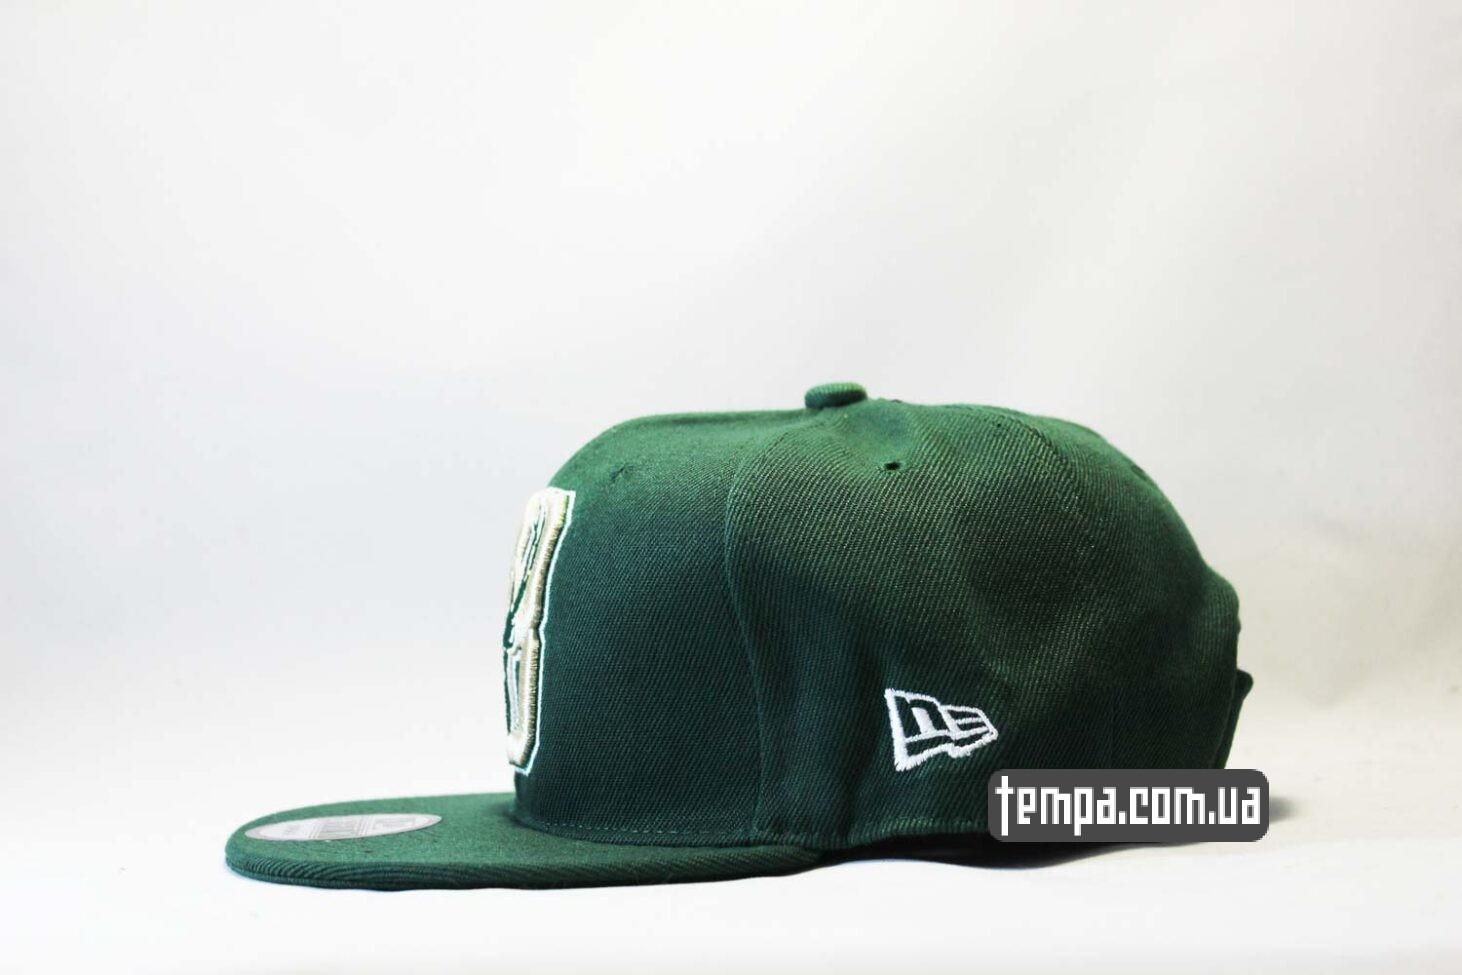 купить Украина кепка snapback Deer green New Era зелена baseball